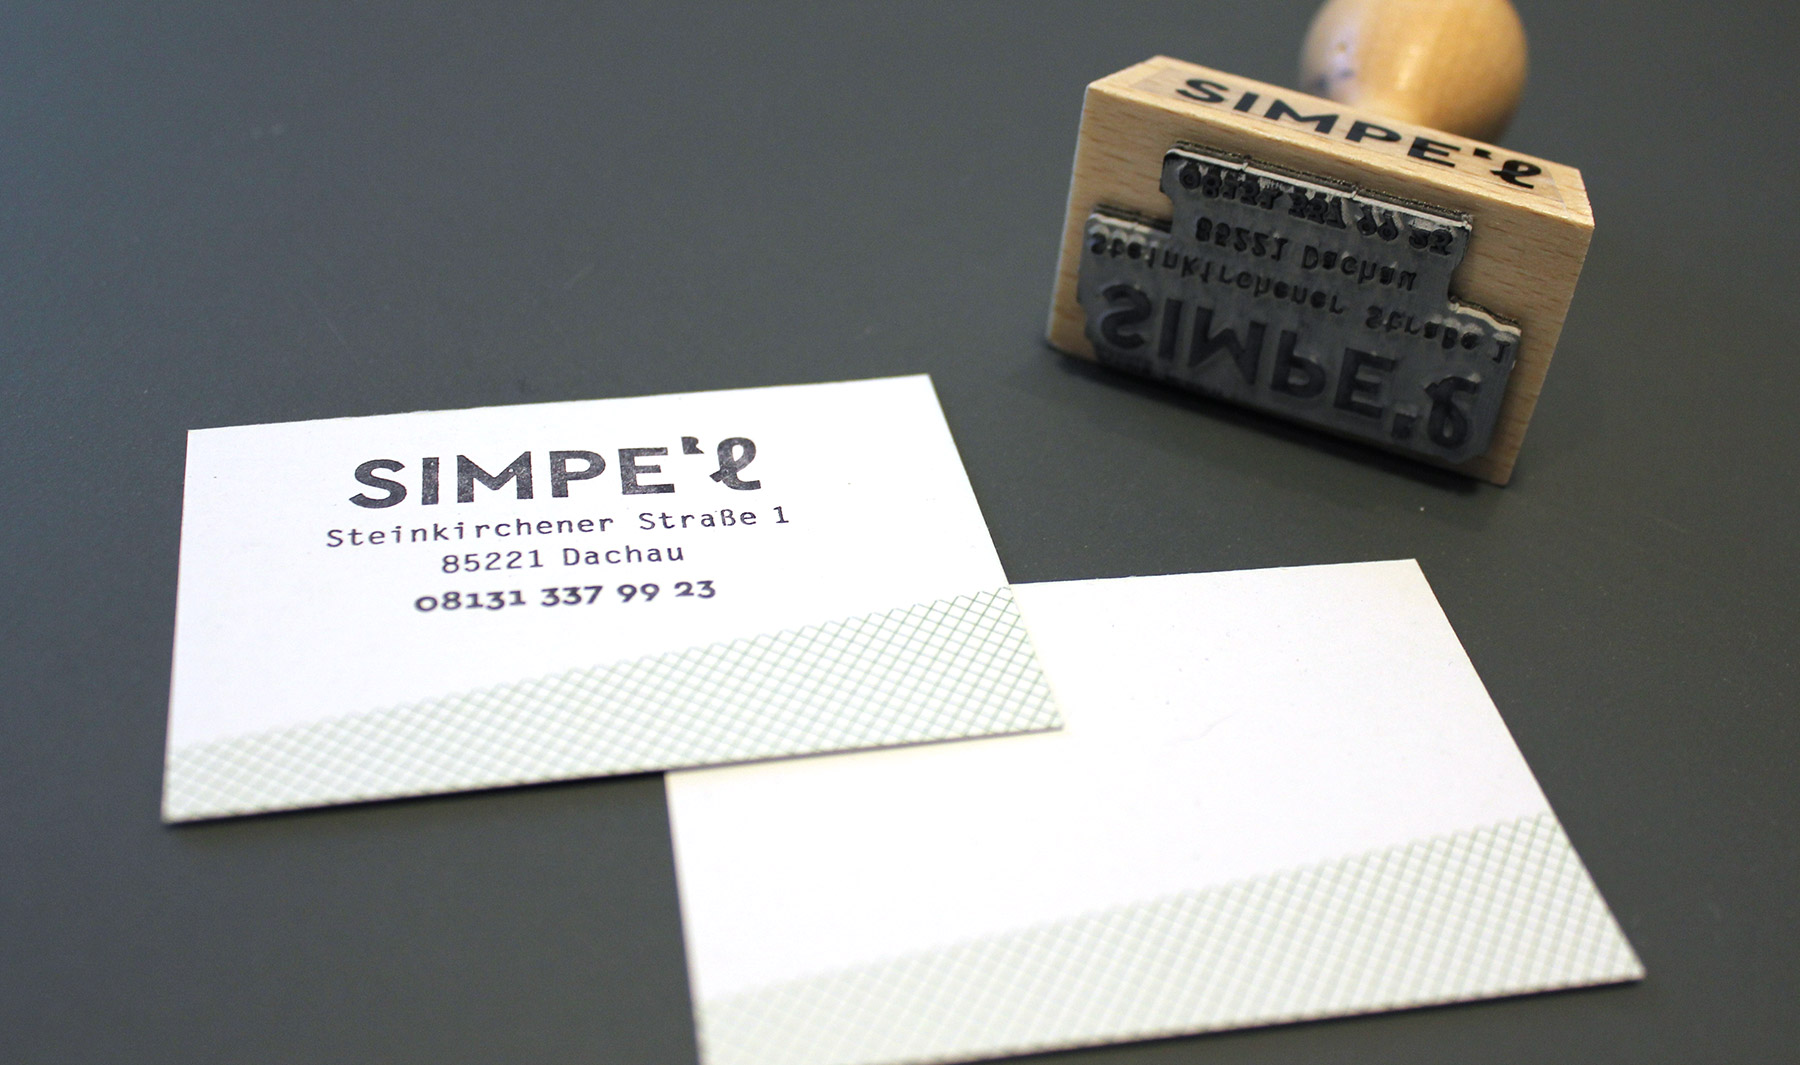 Stempel für den Unverpacktladen Simpel